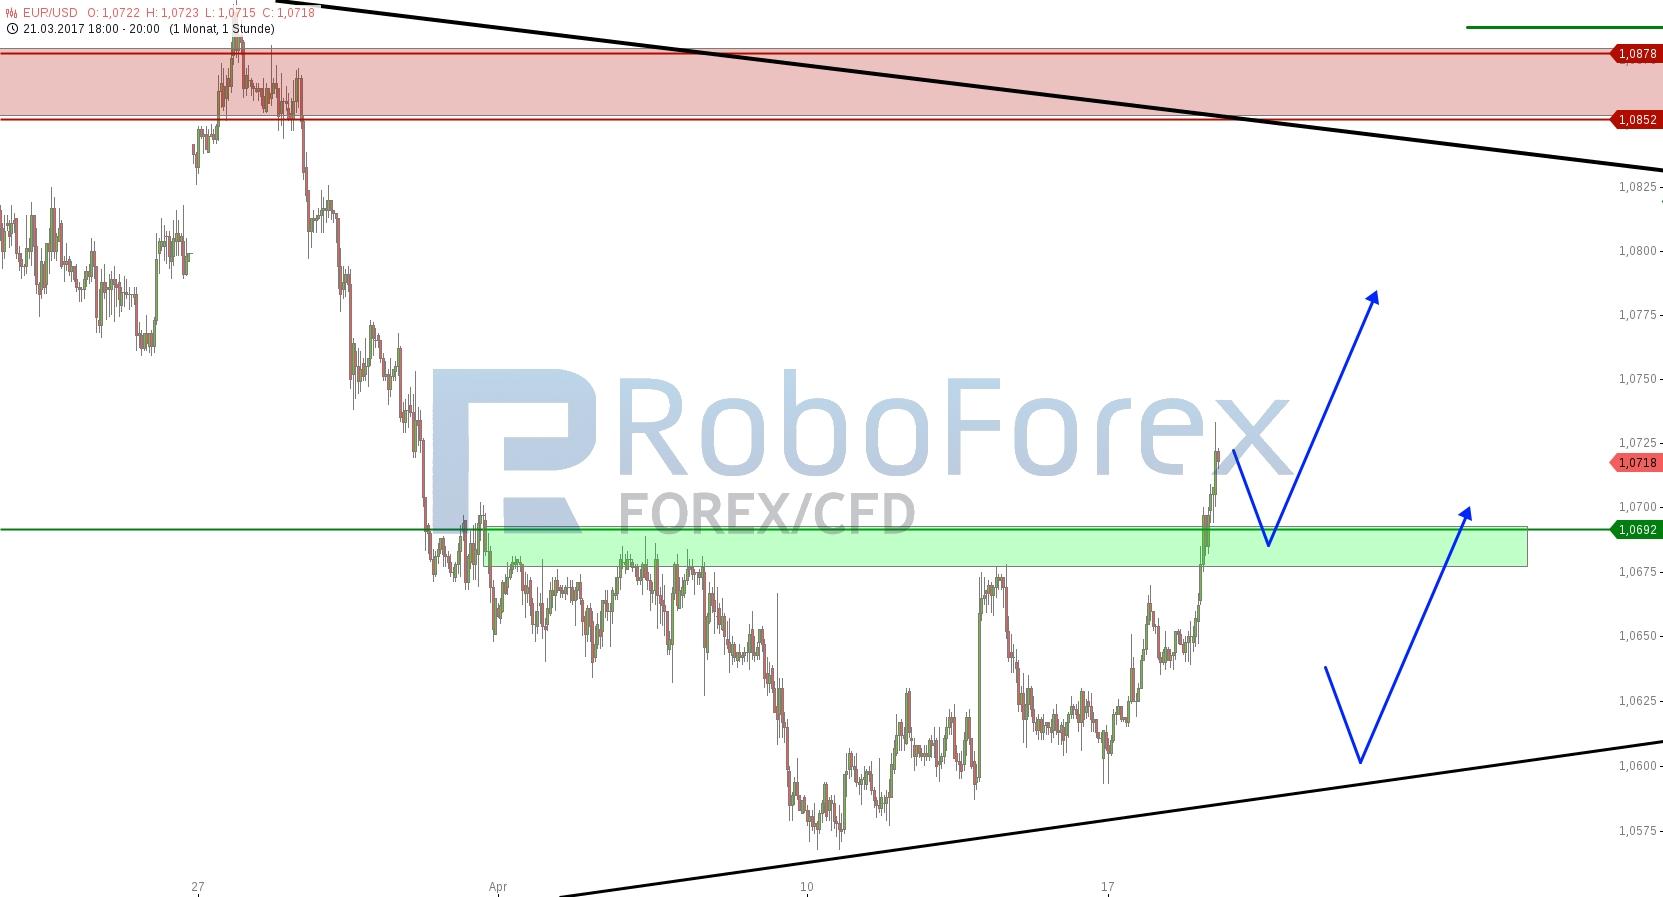 chart-18042017-2002-eurusd-roboforex.jpg